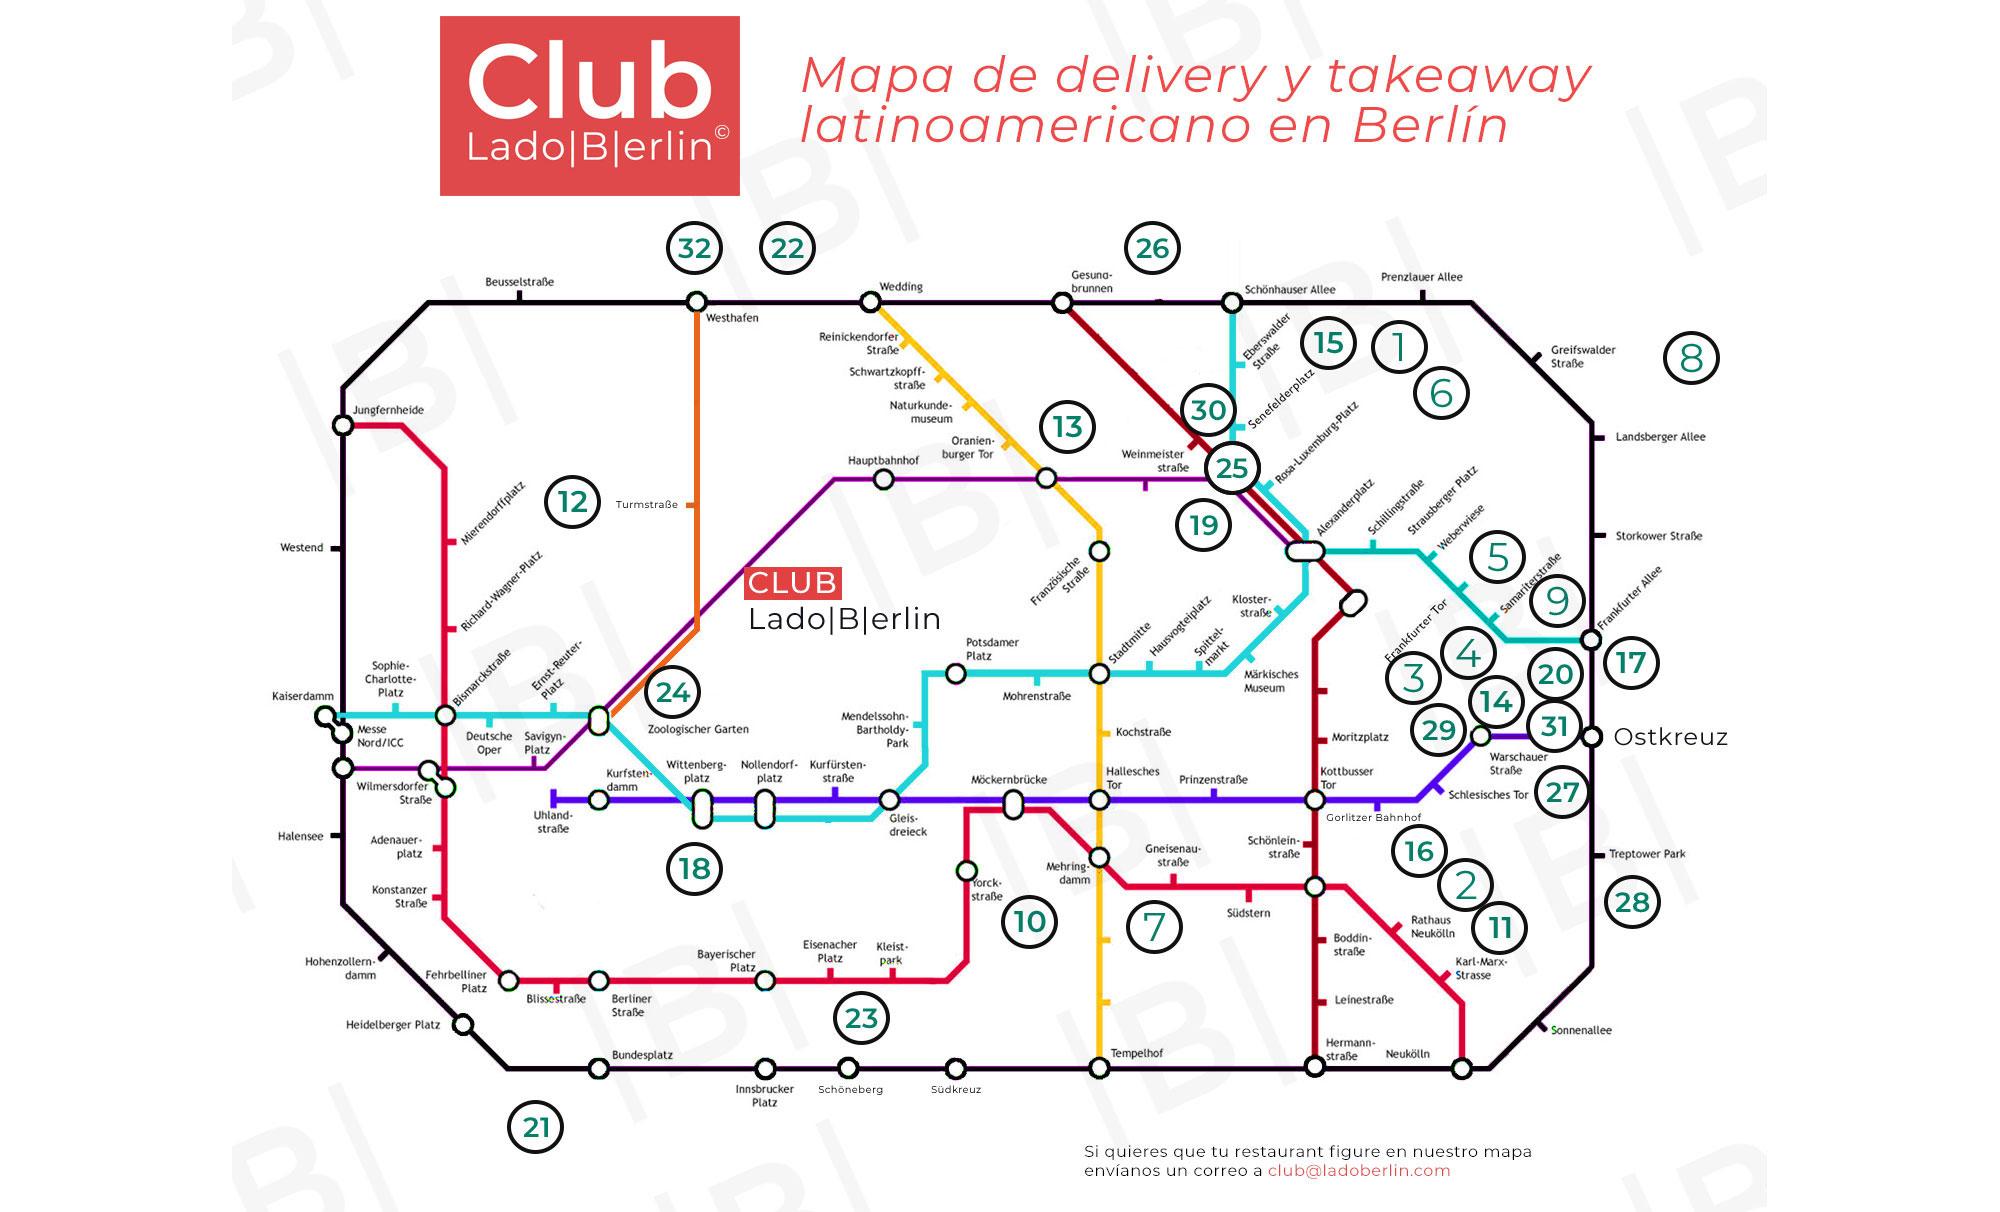 Mapa Restaurantes Latinoamericanos de Berlín. Club Lado|B|erlin©